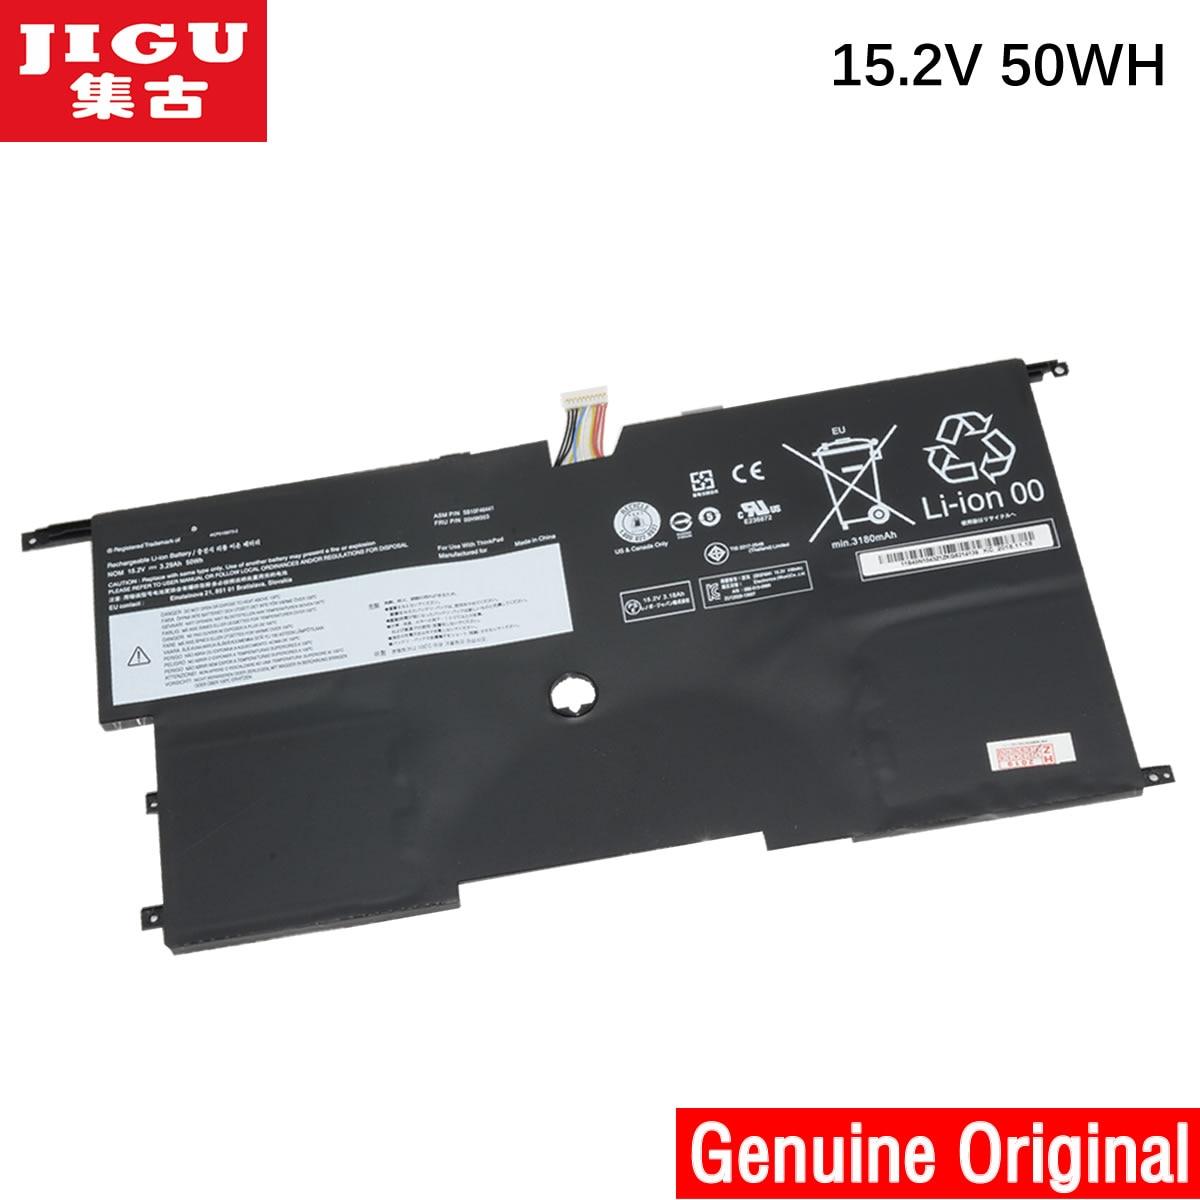 Batería para ordenador portátil JIGU 15,2 V 50WH ORIGNAL 00HW002 00HW003 45N1070 45N1071 LENOVO para ThinkPad X1 Carbono (3444)